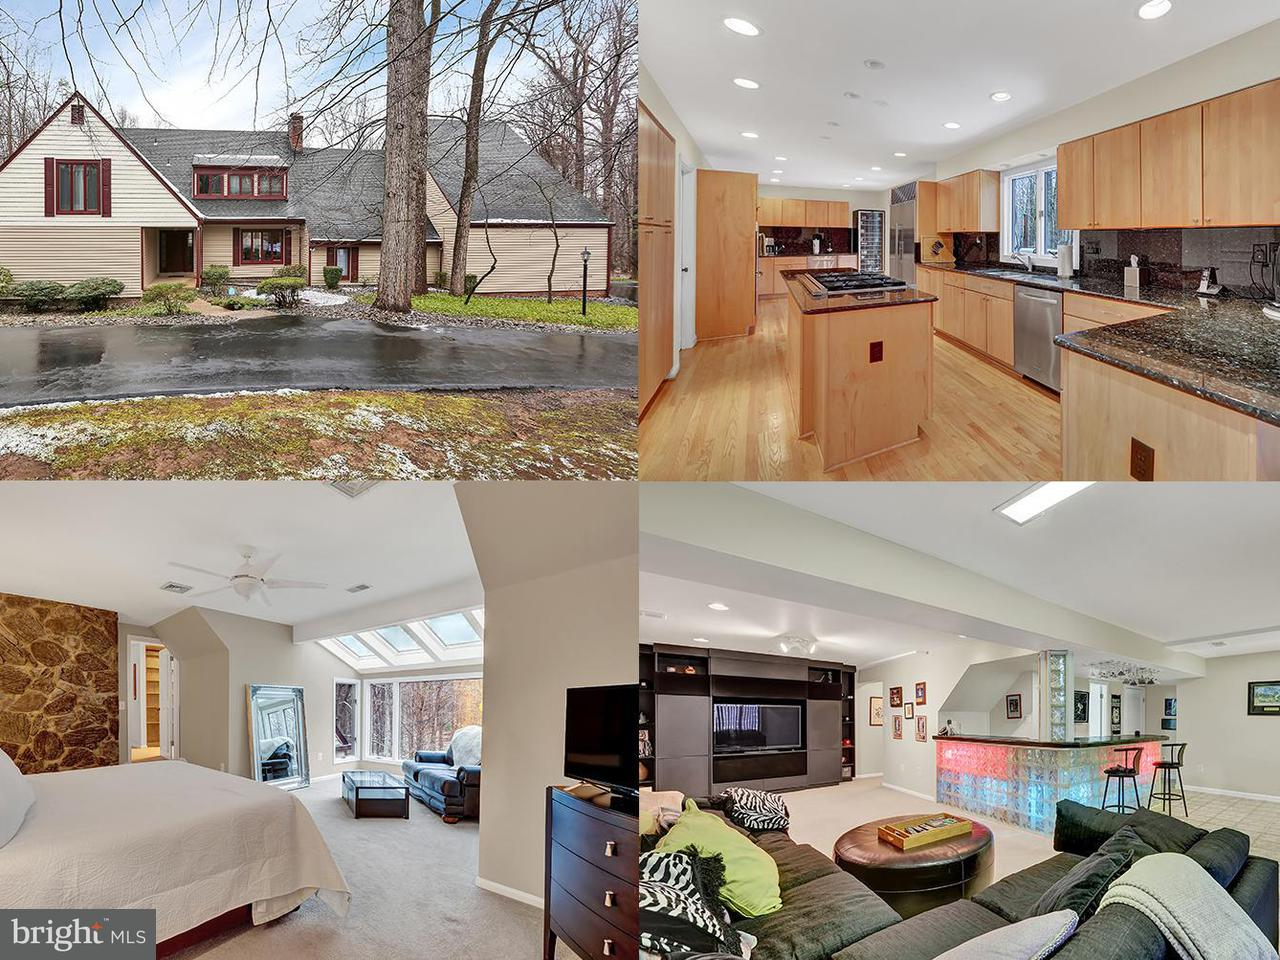 獨棟家庭住宅 為 出售 在 7920 Woodland Hills Lane 7920 Woodland Hills Lane Fairfax Station, 弗吉尼亞州 22039 美國